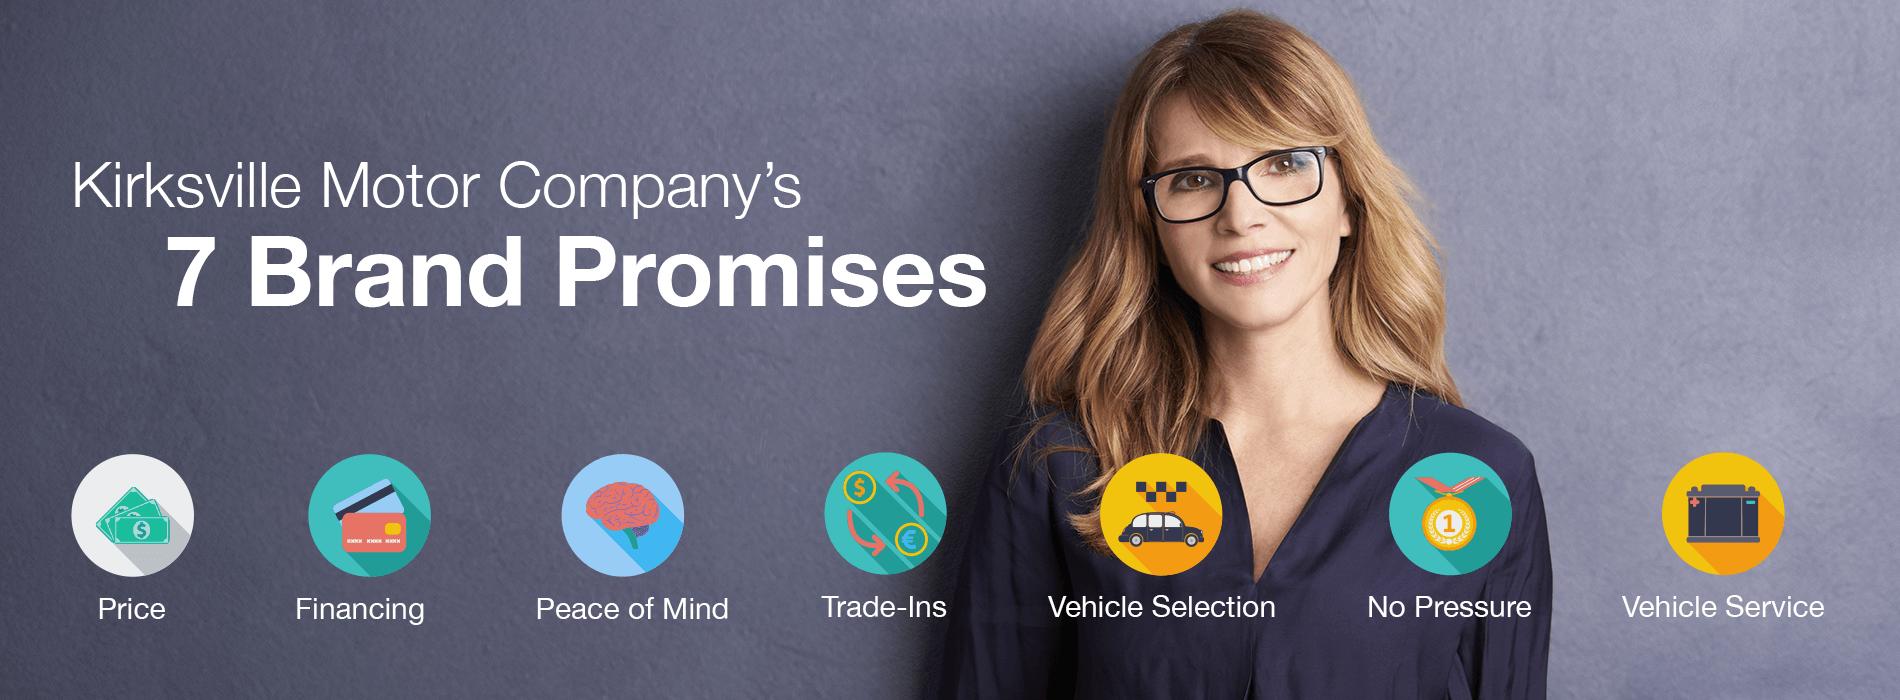 7 Brand Promises